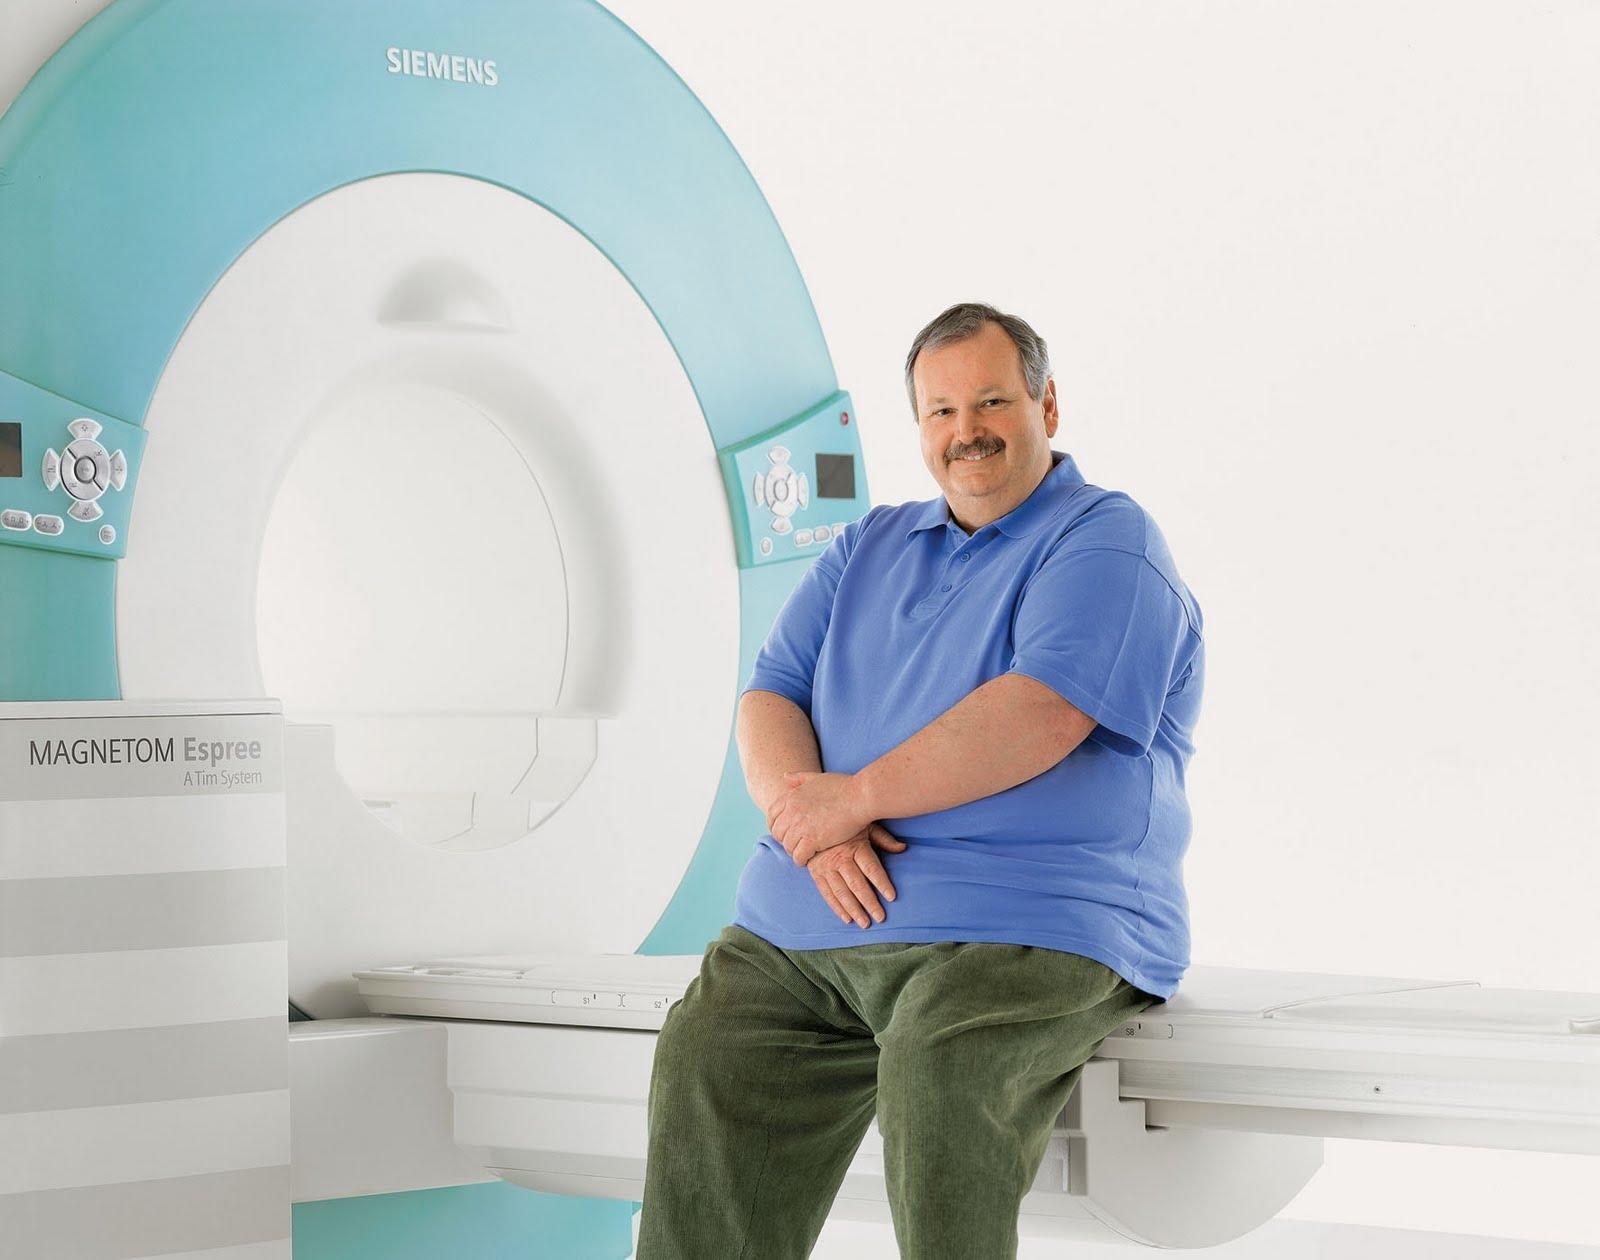 МРТ для полных